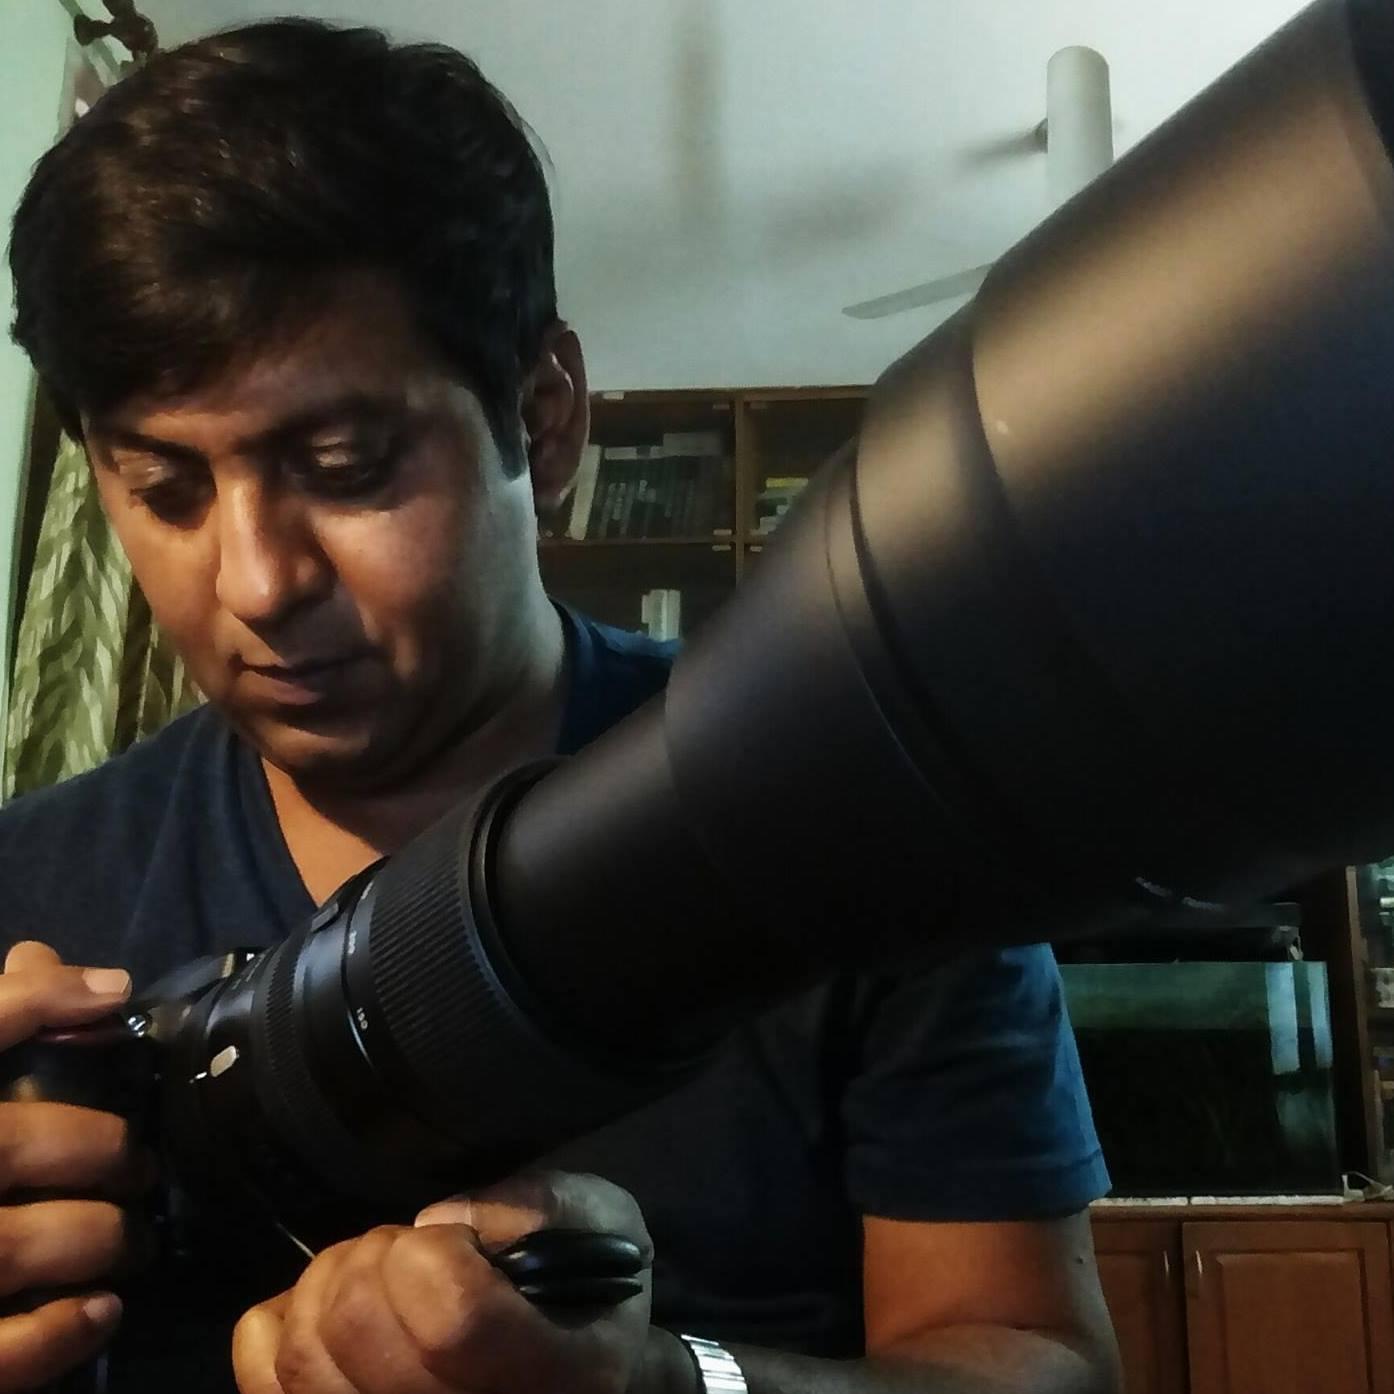 Bappaditya Mukhopadhyay testimonial